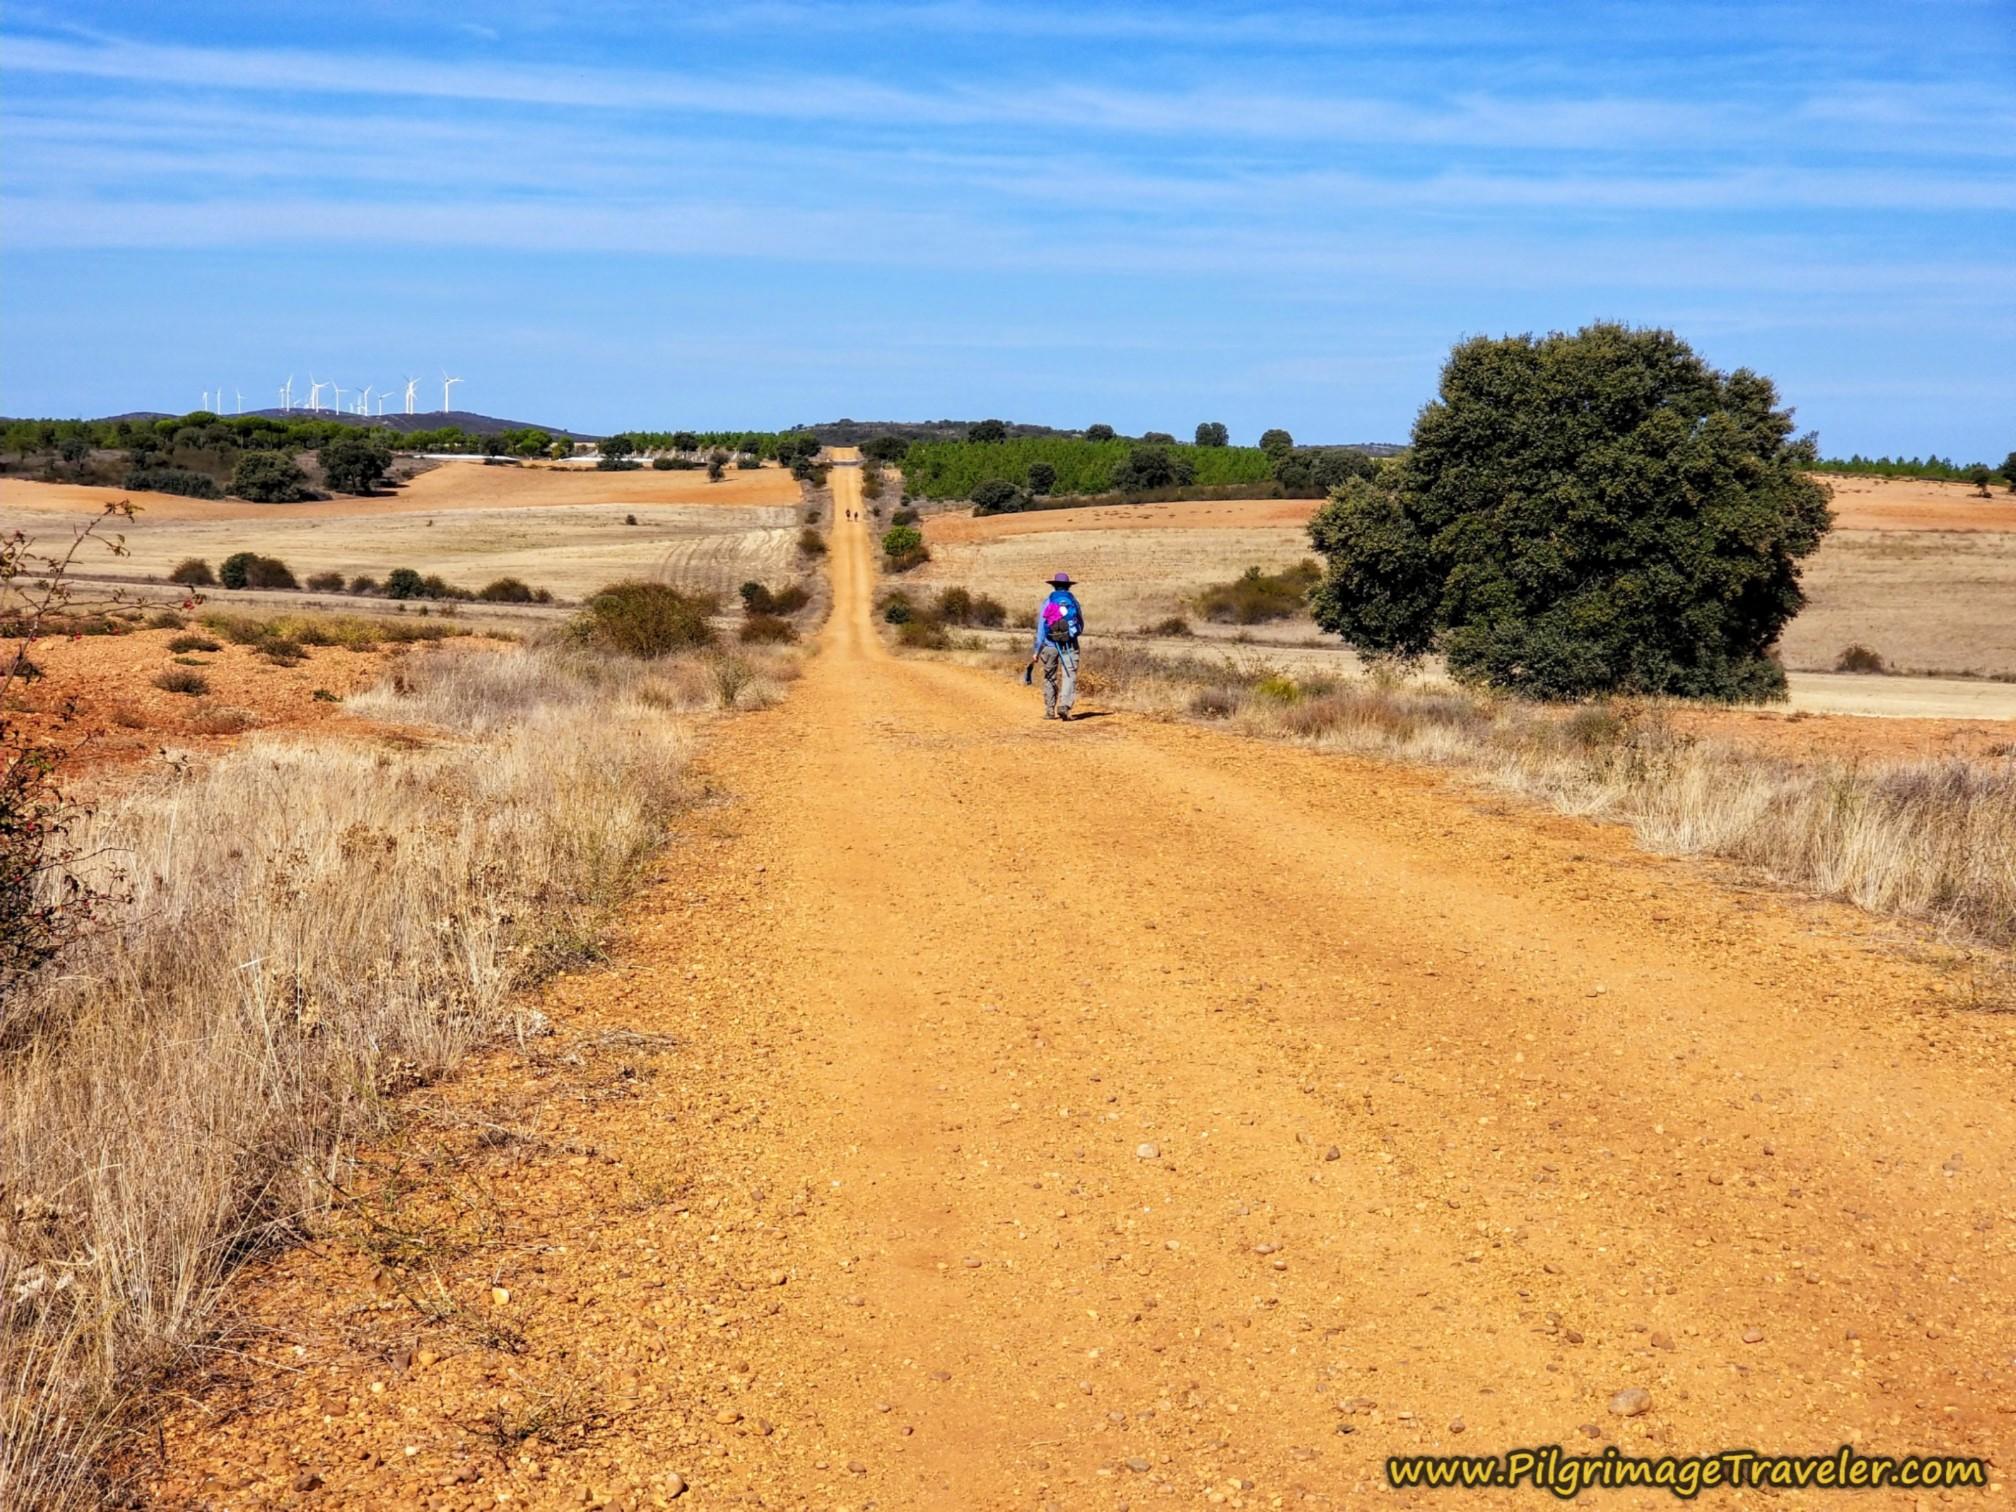 Nadine on Long Open Road on the Camino Sanabrés from Granja de Moreruela to Tábara